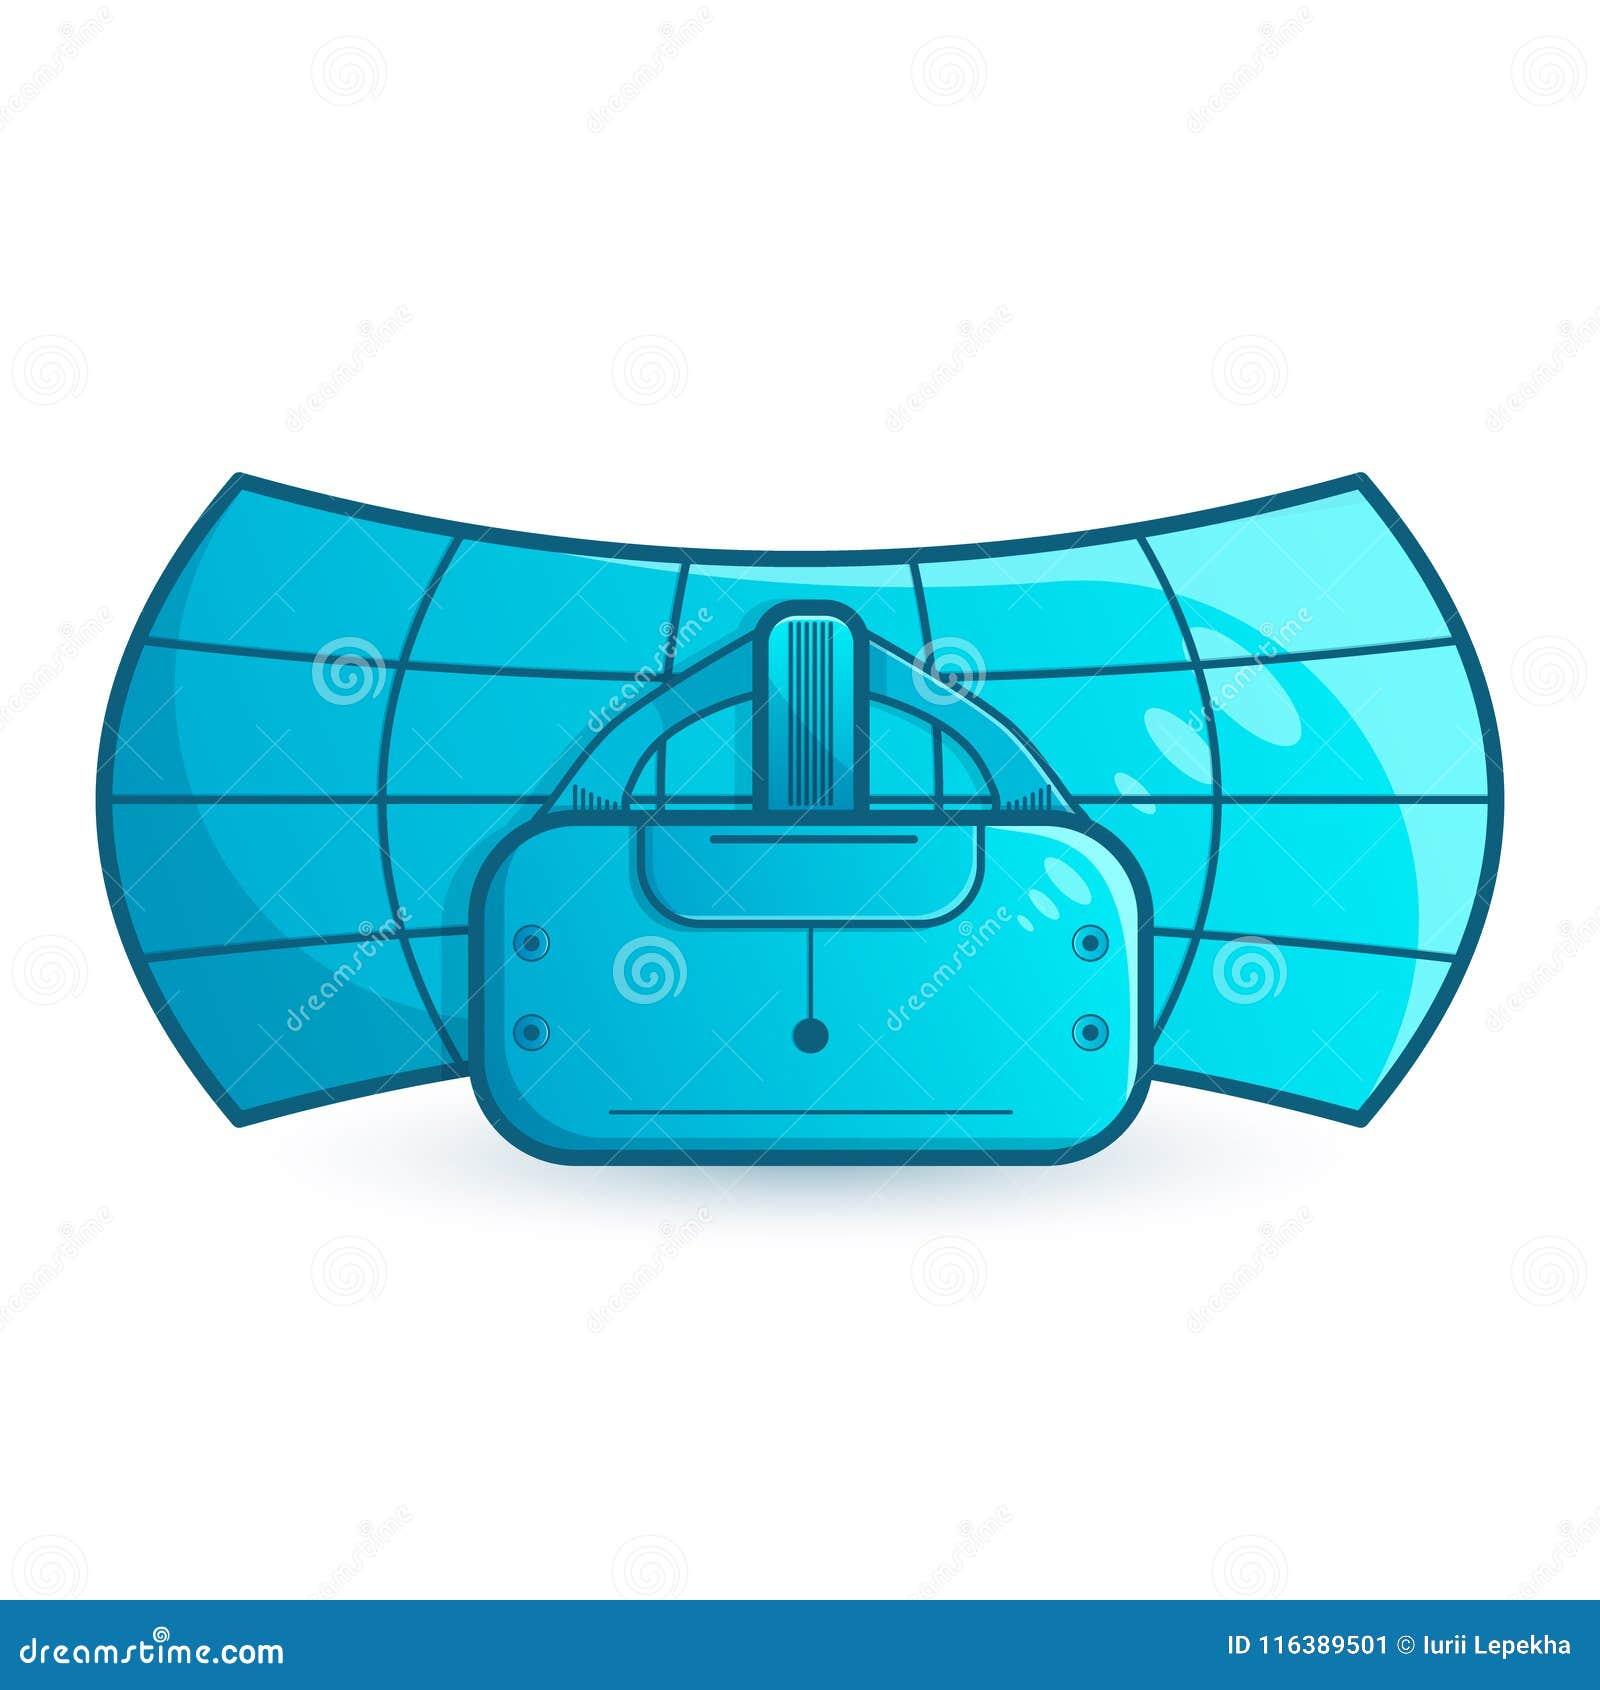 Stereoscopic VR illustration. Vector virtual digital cyberspace technology. Innovation device.